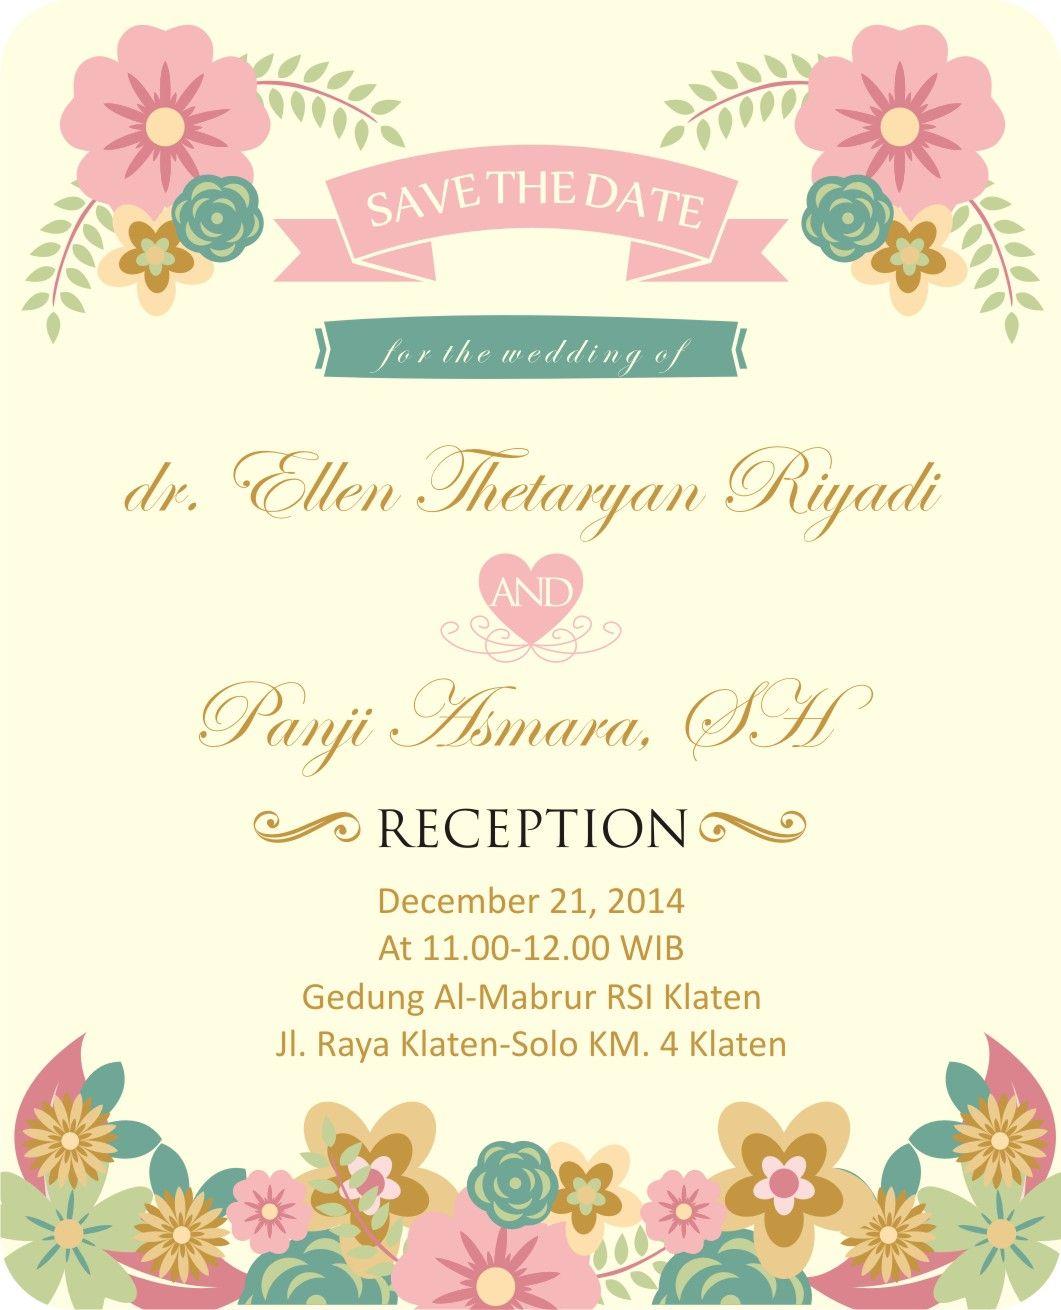 Wedding E Invitations: Online Wedding Invitation, E-invitation, Wedding Inviation